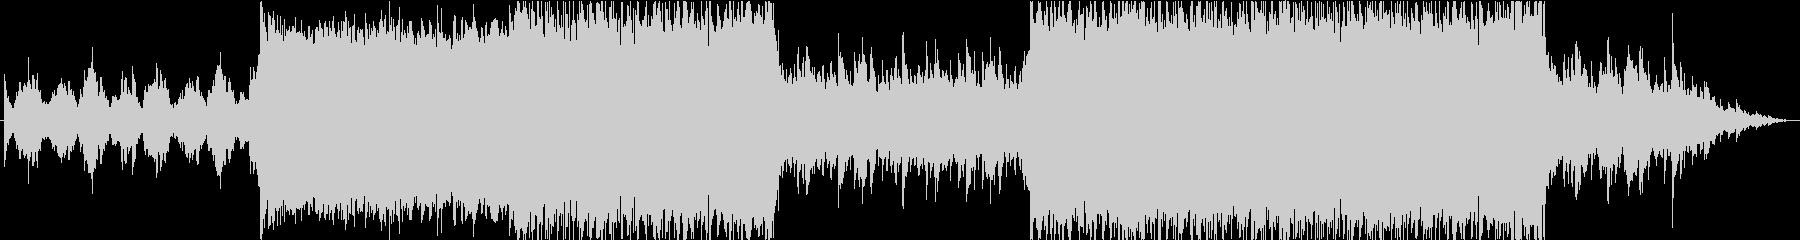 【BGM】ソフトなアコースティックポップの未再生の波形